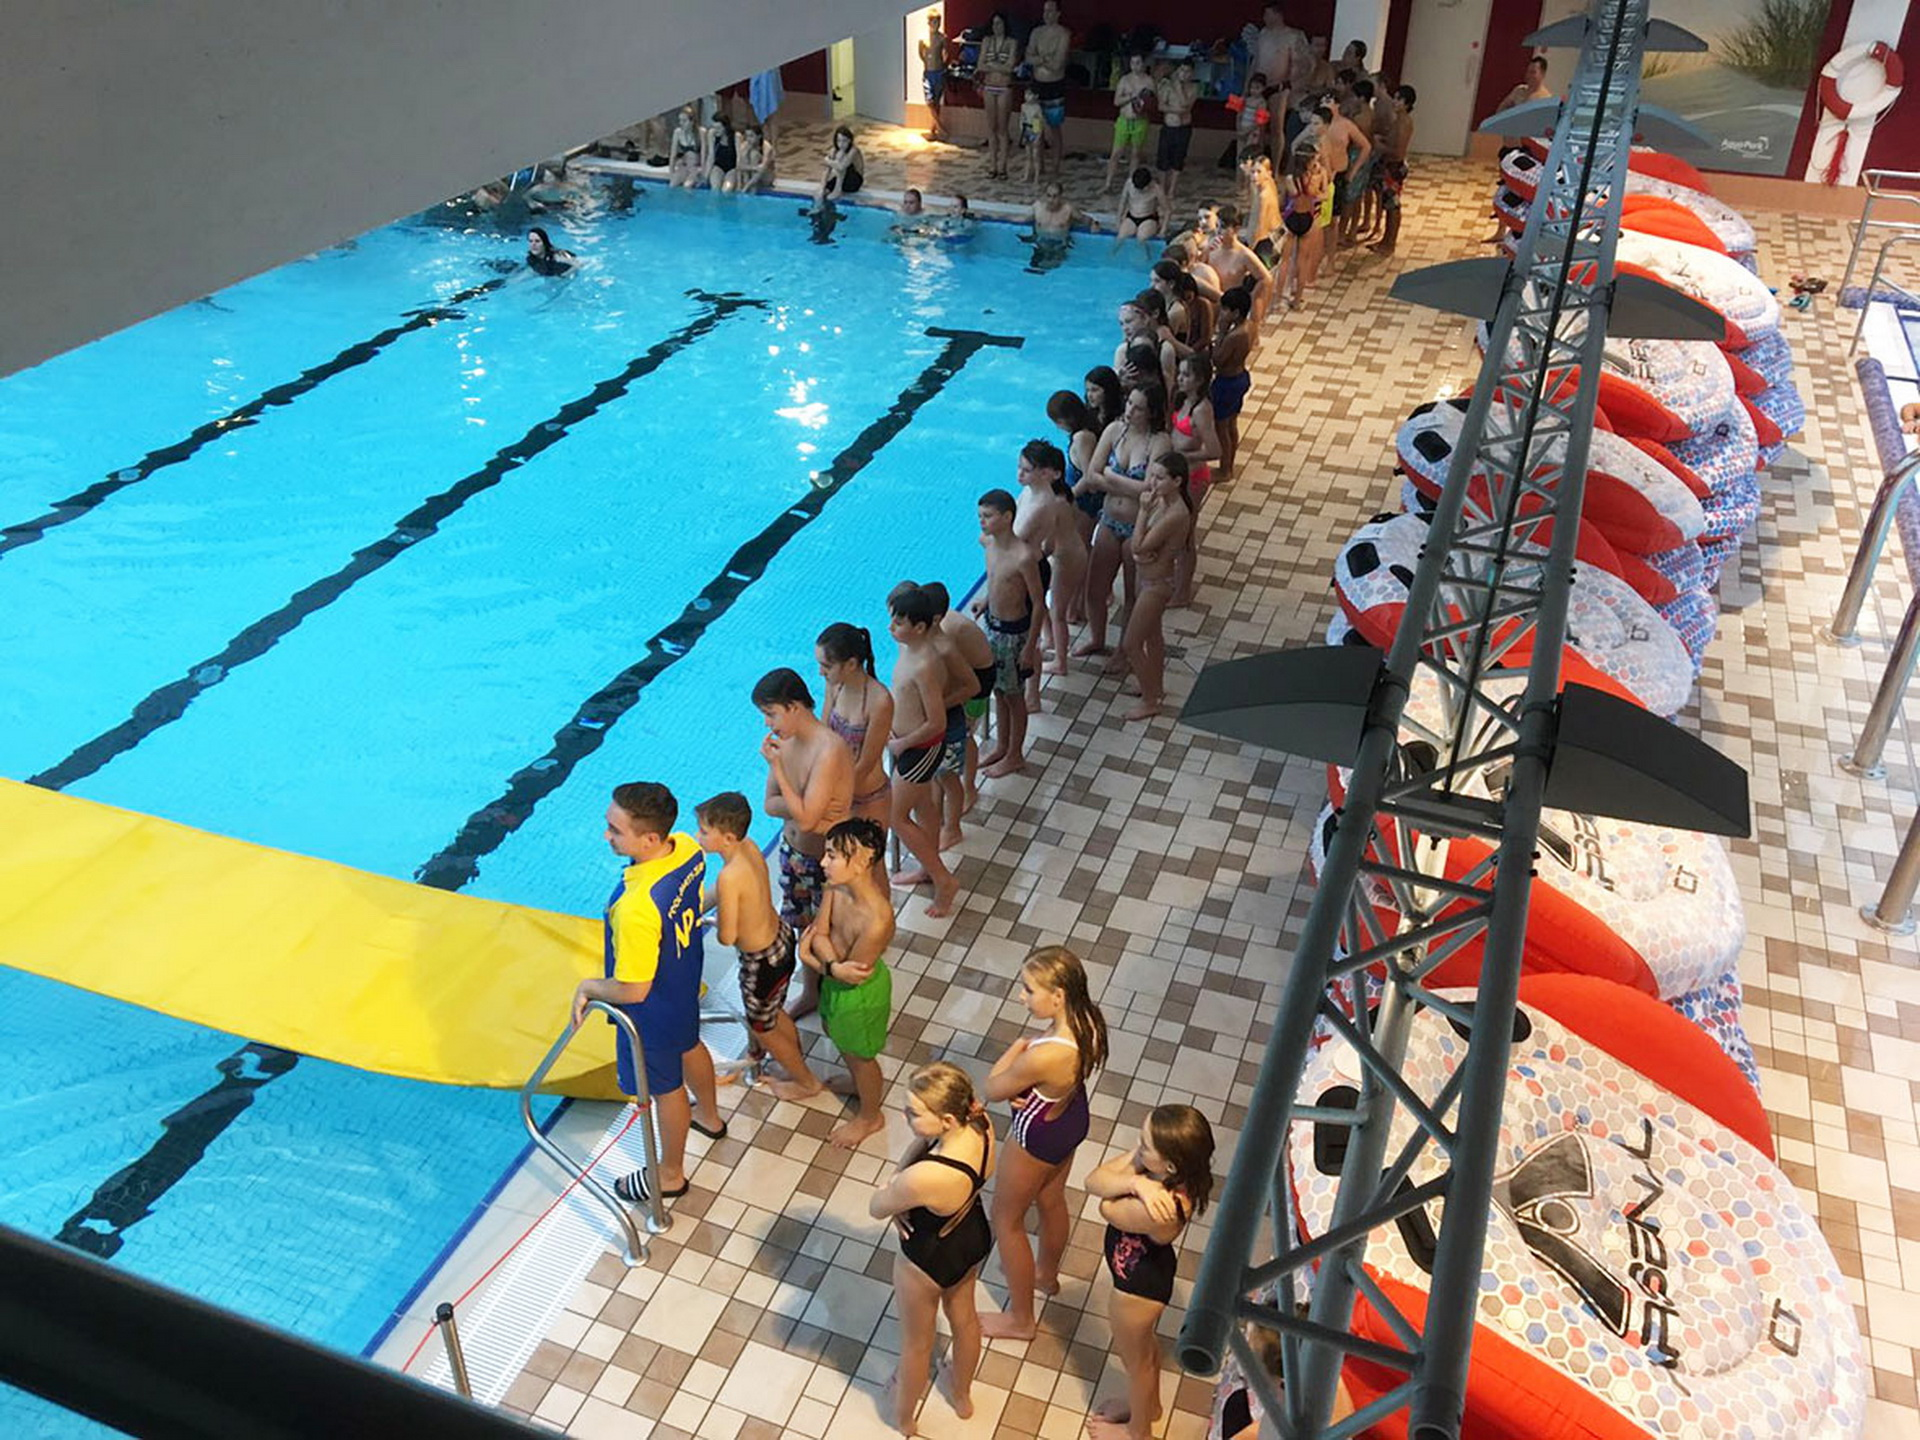 Tolle Stimmung Bei Der Kino Pool Party Aquapark Baunatal